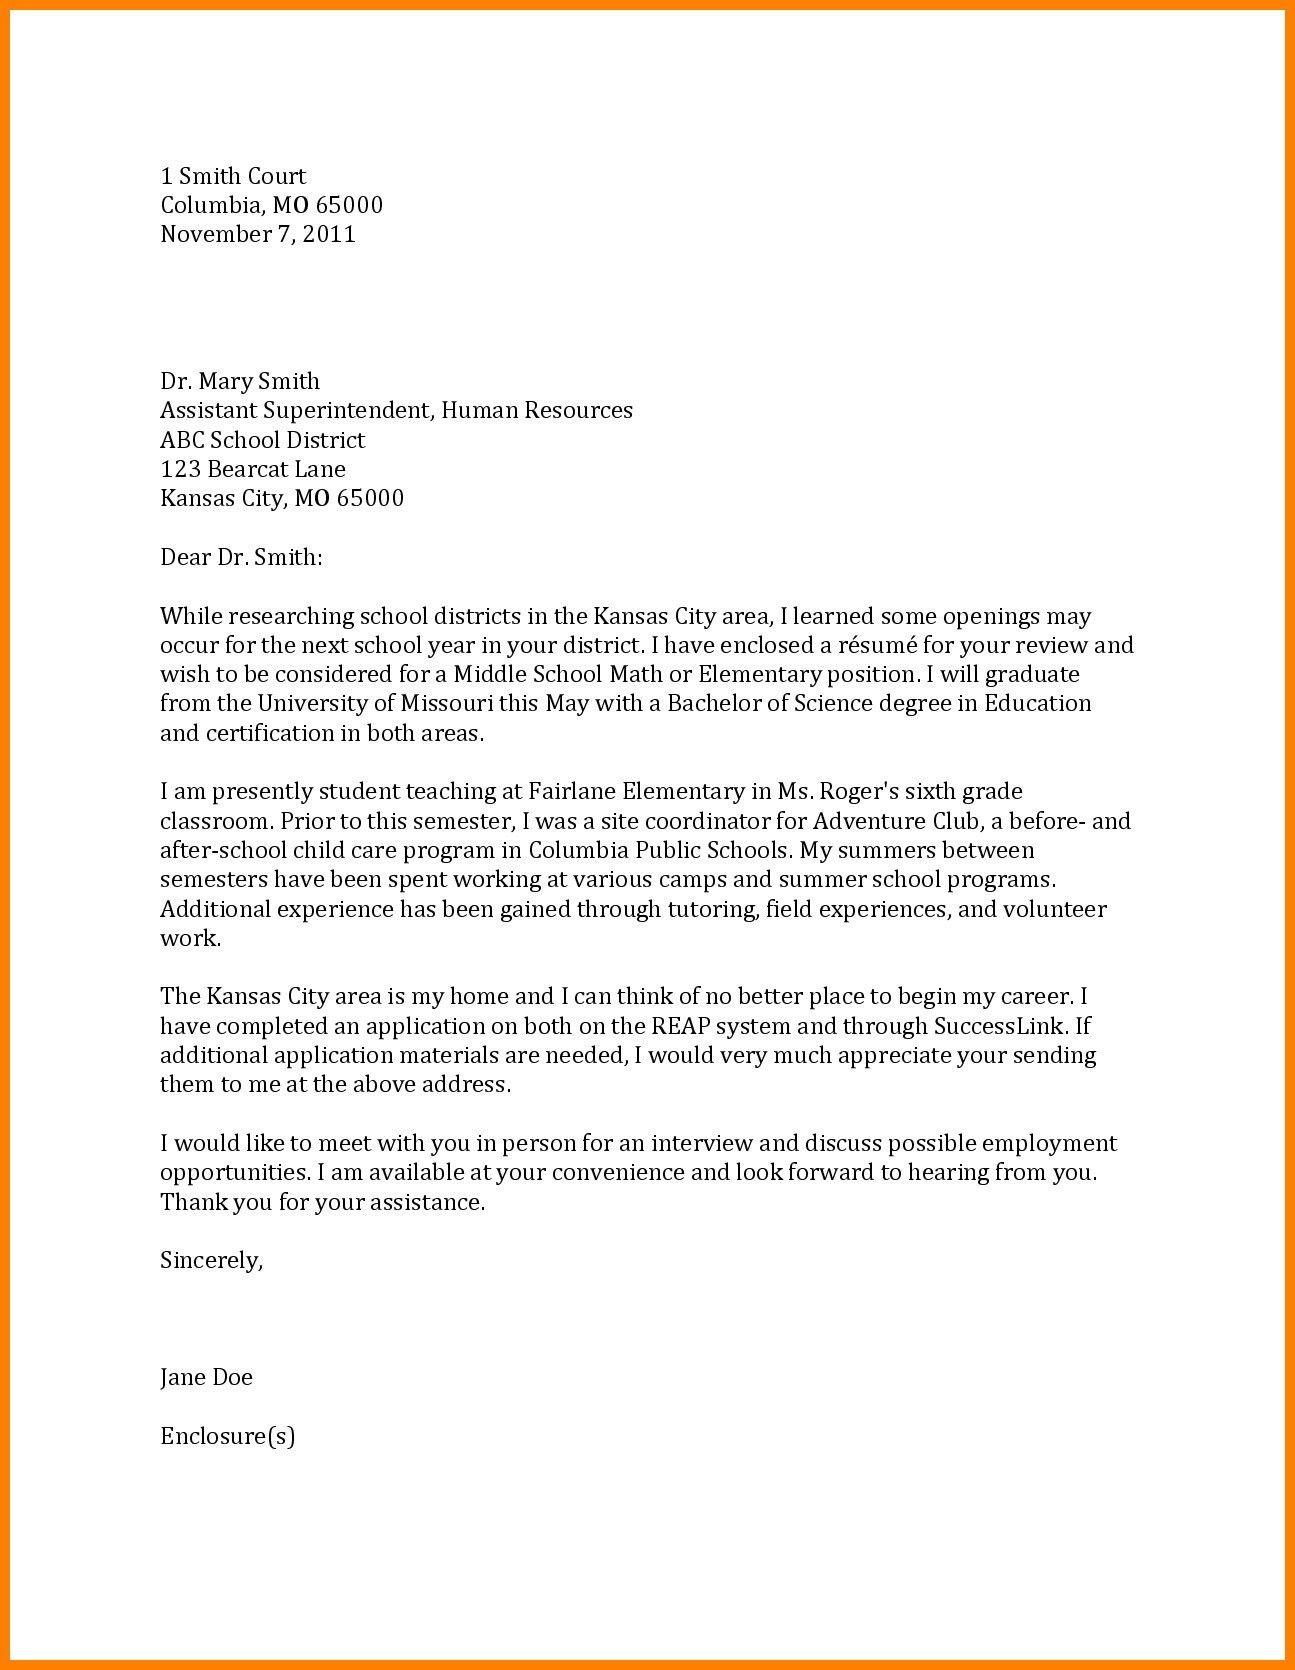 Cover letter example archives letterlyinfo cover